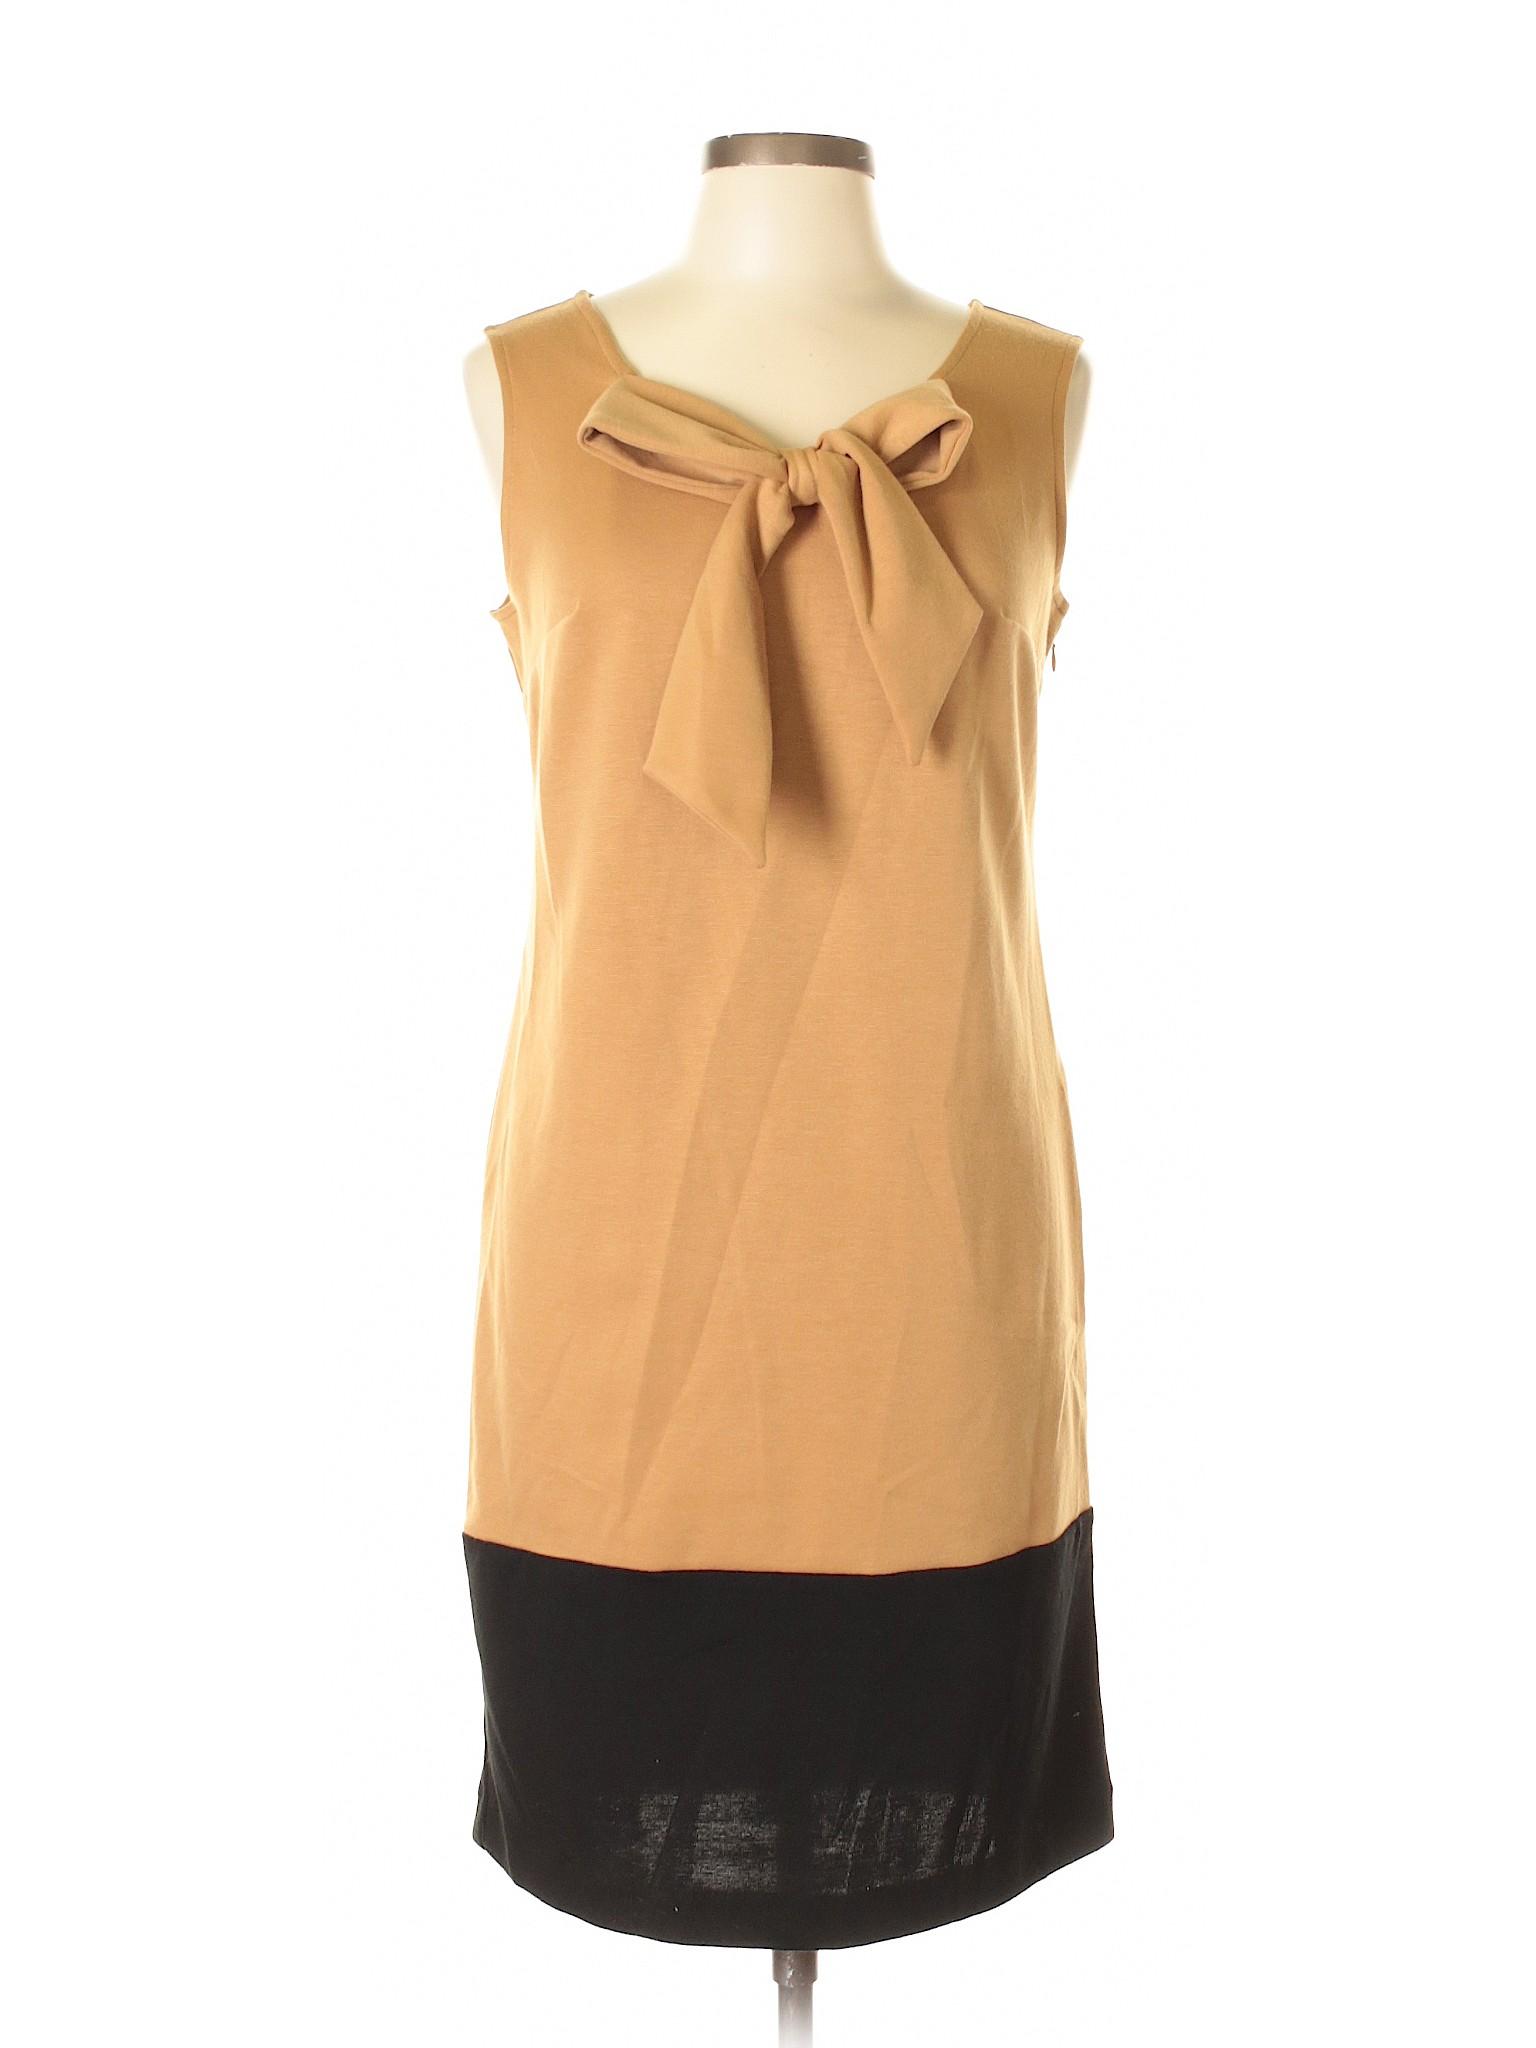 Selling Casual Dress Selling Merona Merona Merona Casual Dress Selling CfC5xnrv